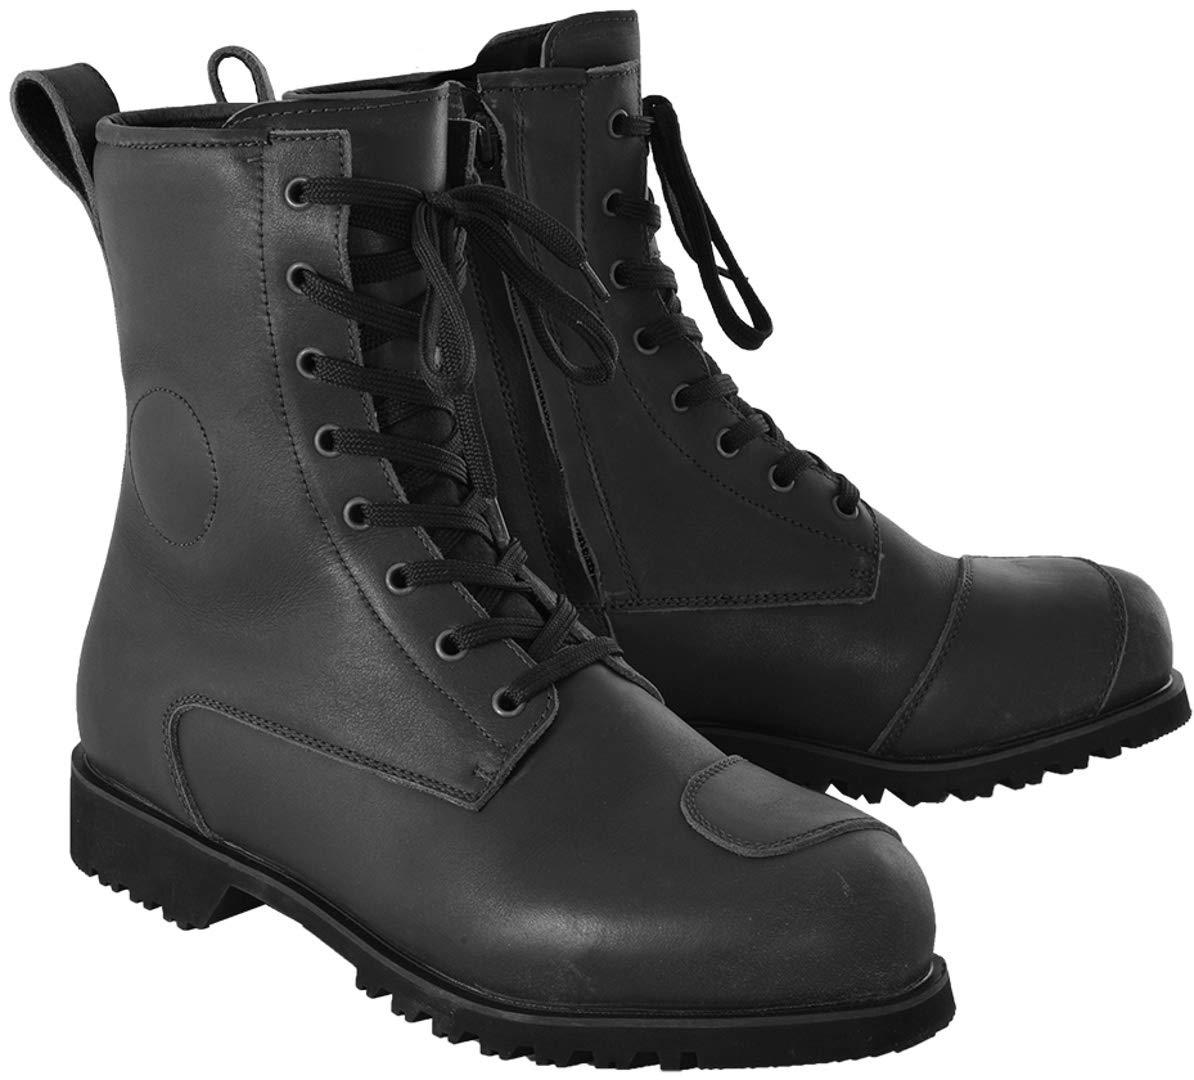 Oxford Merton Heritage Mens Waterproof Leather Motorcycle Boots Black